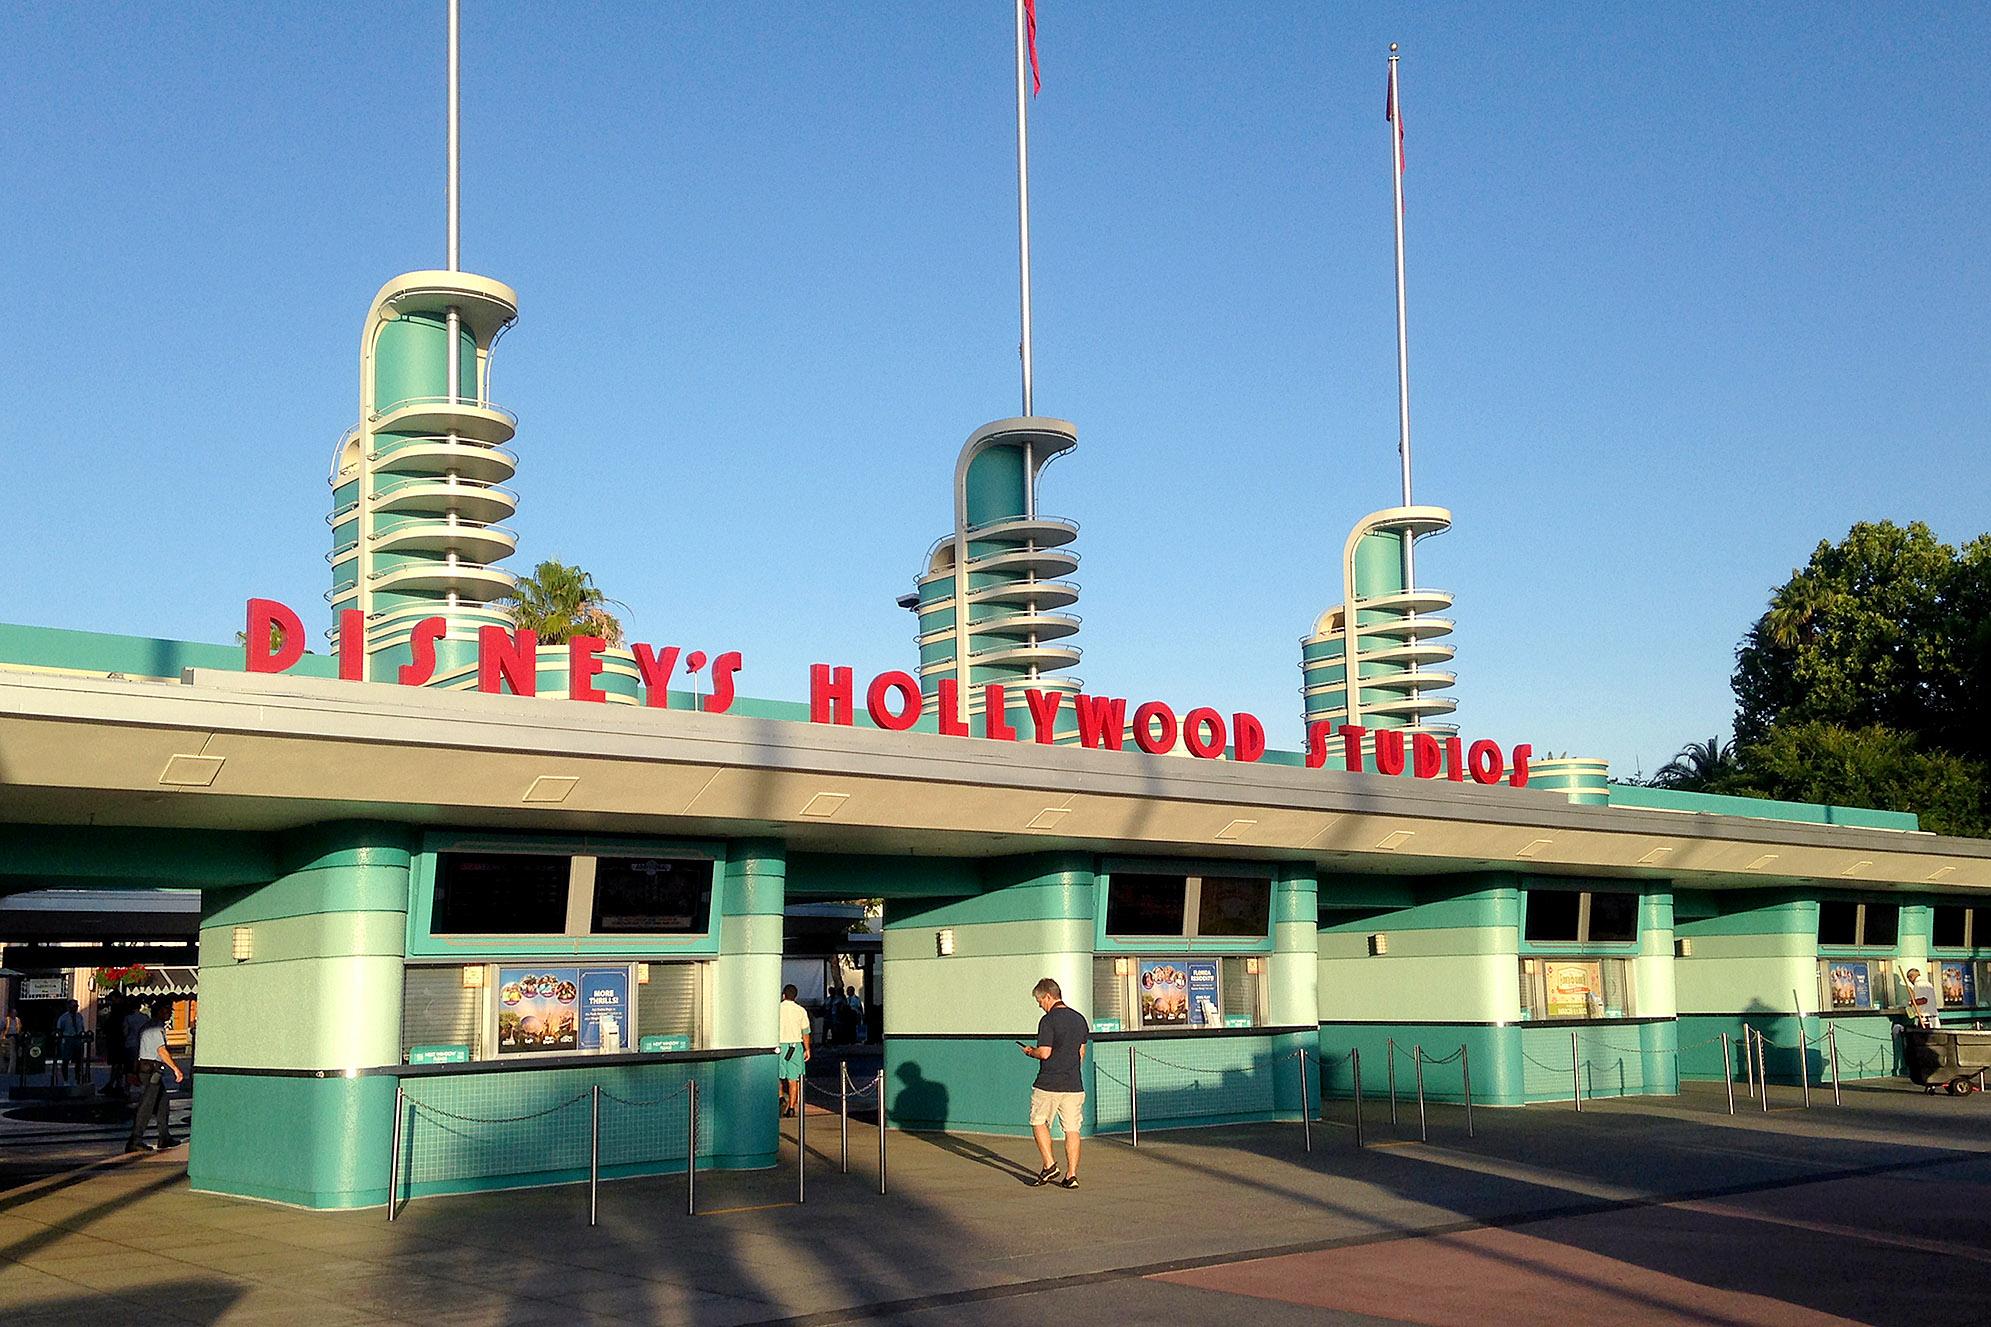 Disney's Hollywood Studios Walt Disney World i Orlando